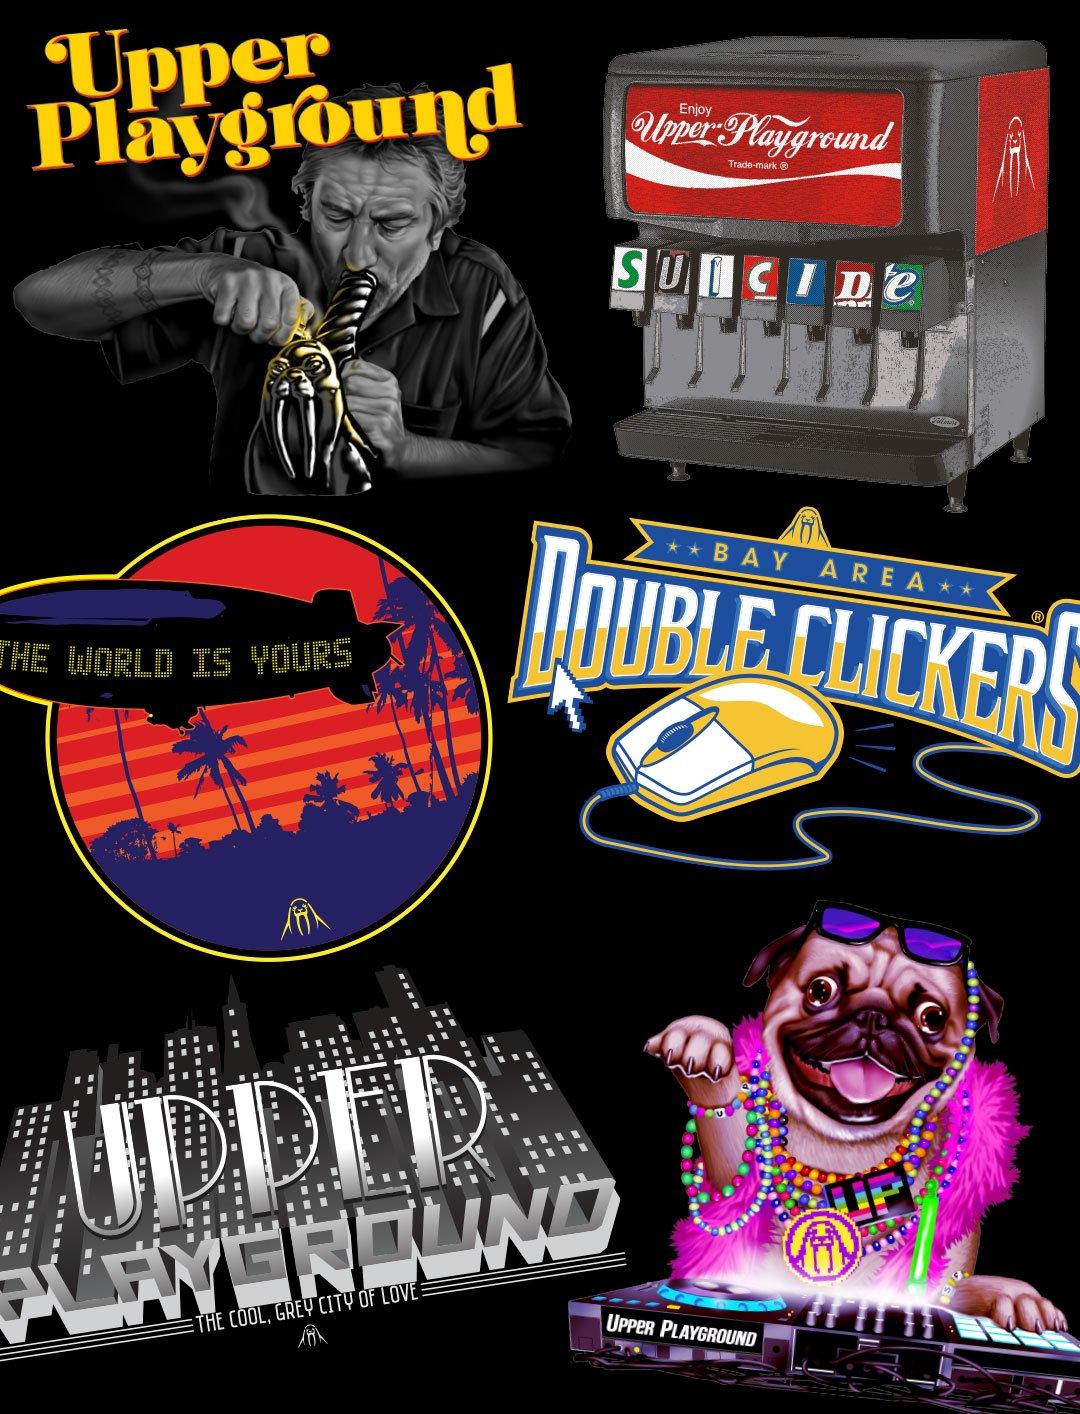 Jeremy Fish, Hoodies, Patches, Van, Bunny, Skull, Fish, Zip, Upper Playground, UP, San Francisco, SF, CA